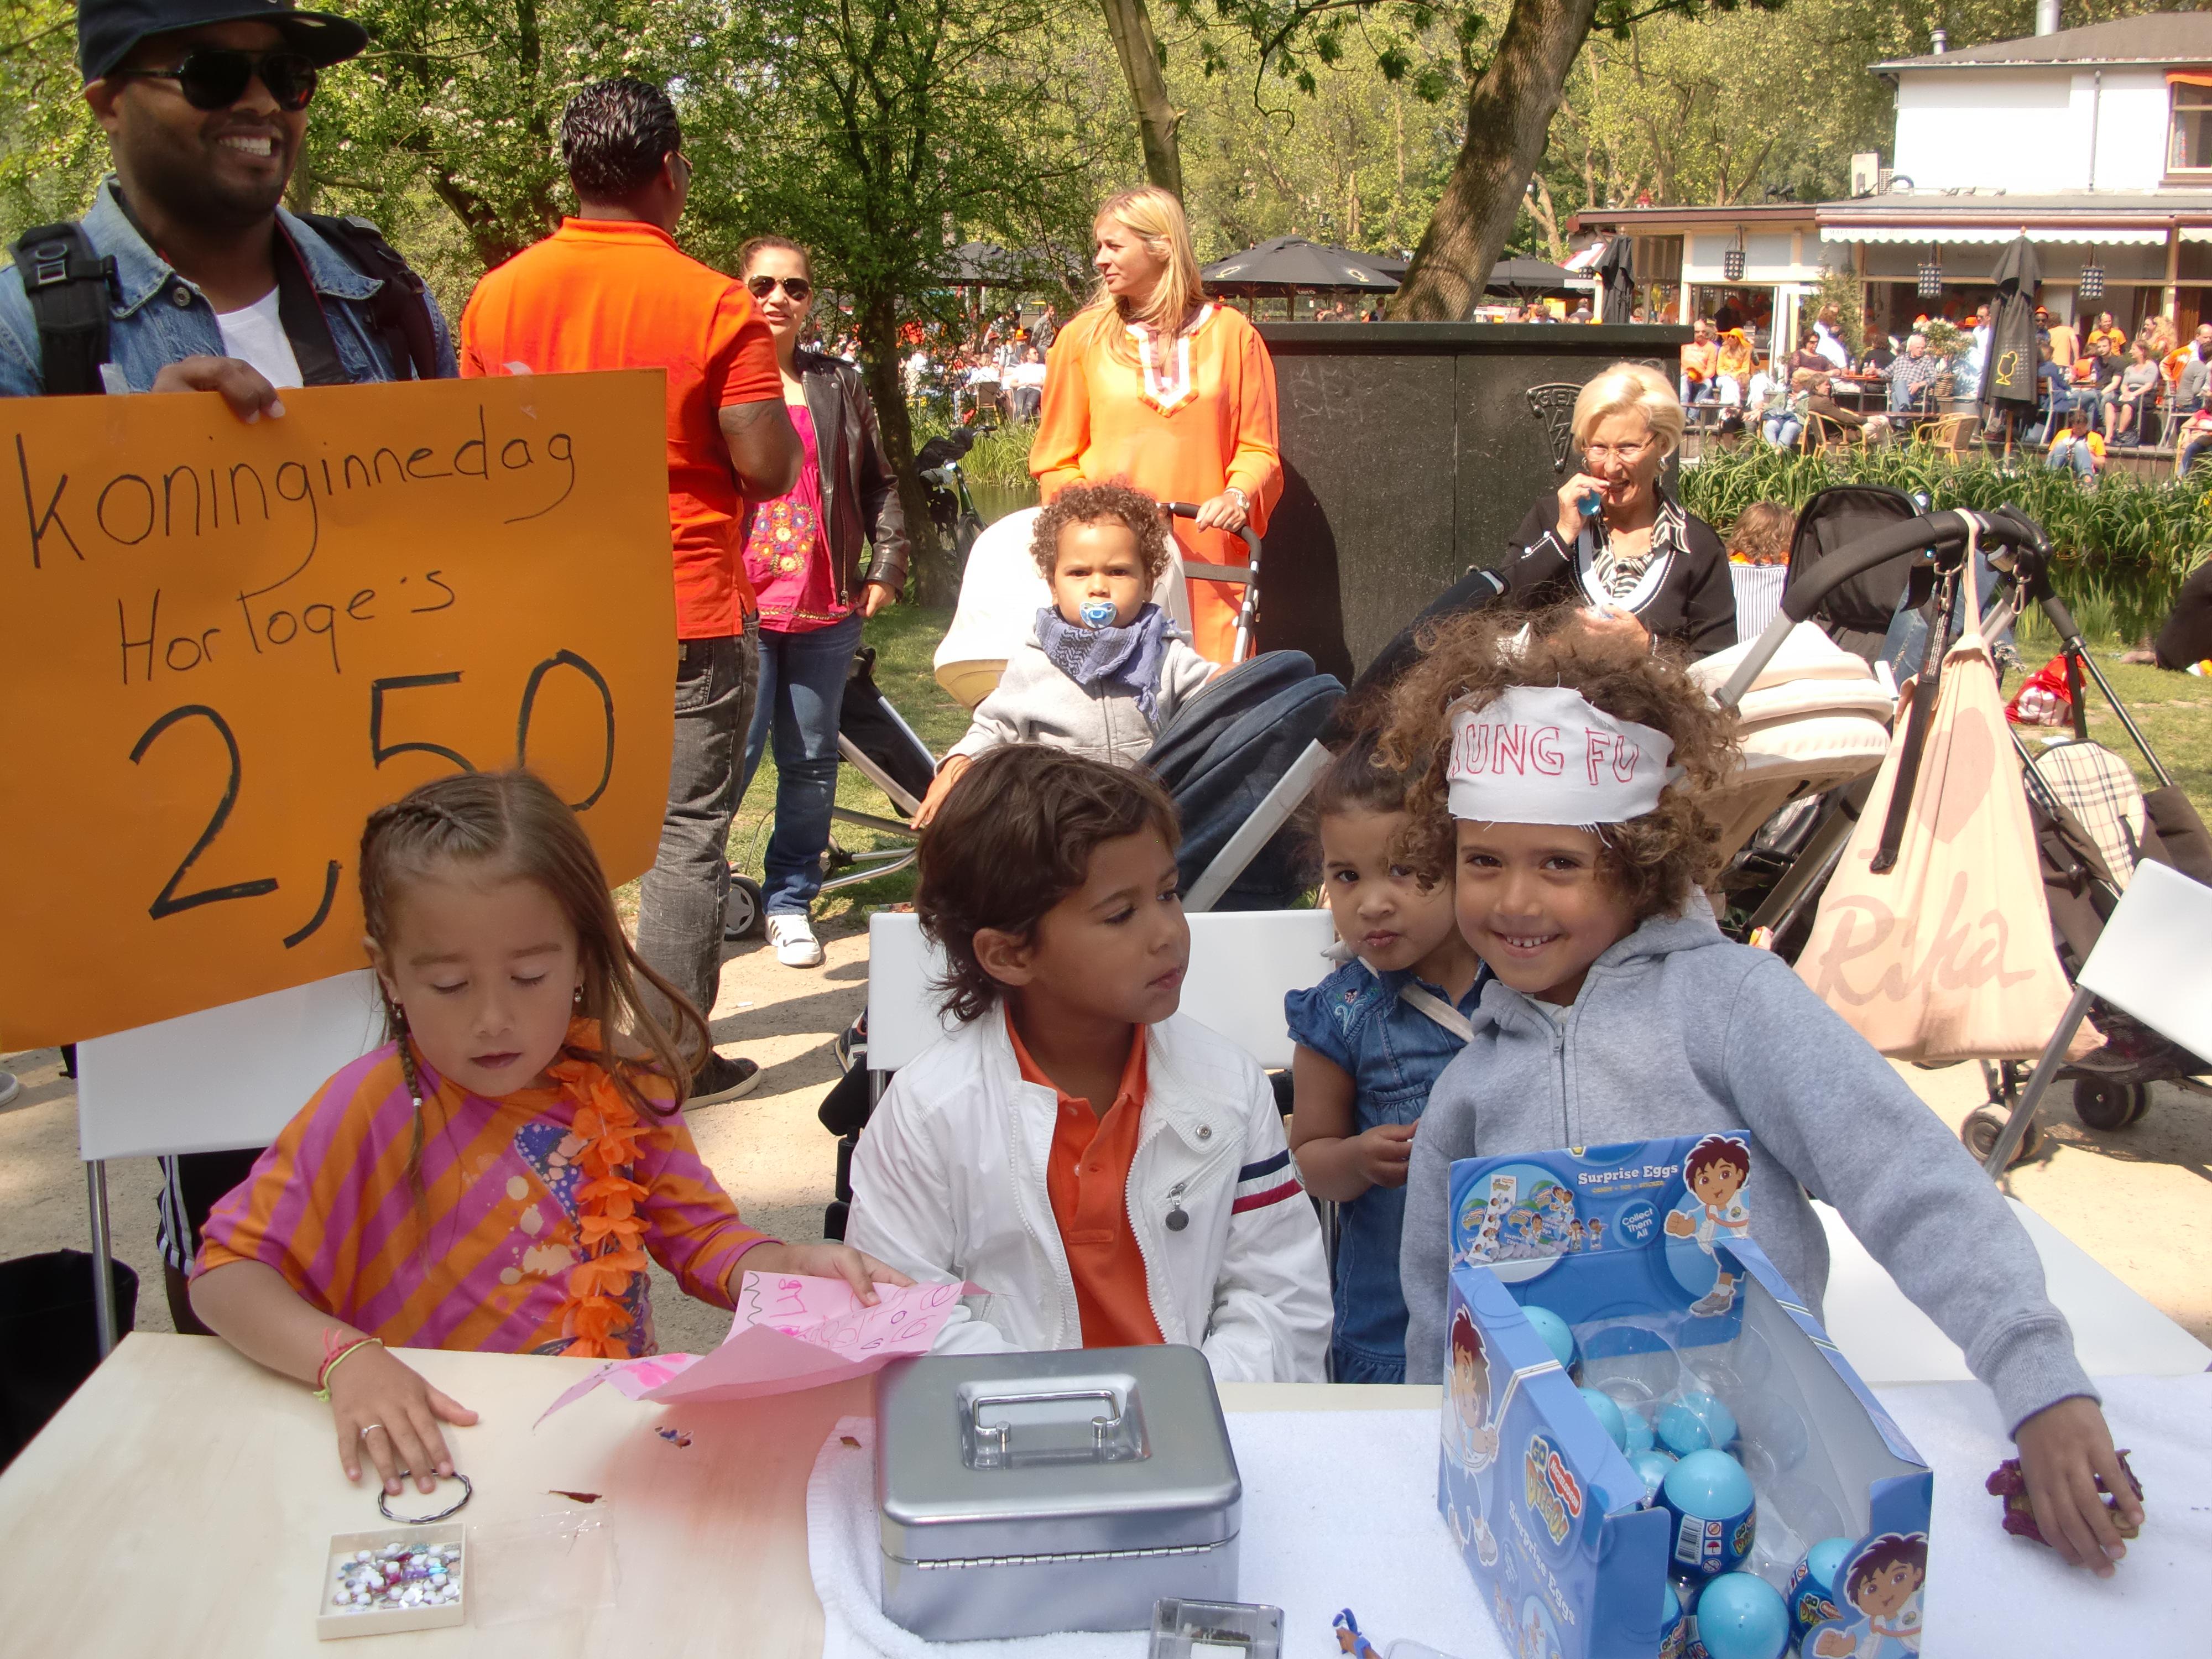 Kids selling stuff in VondelPark, Amsterdam